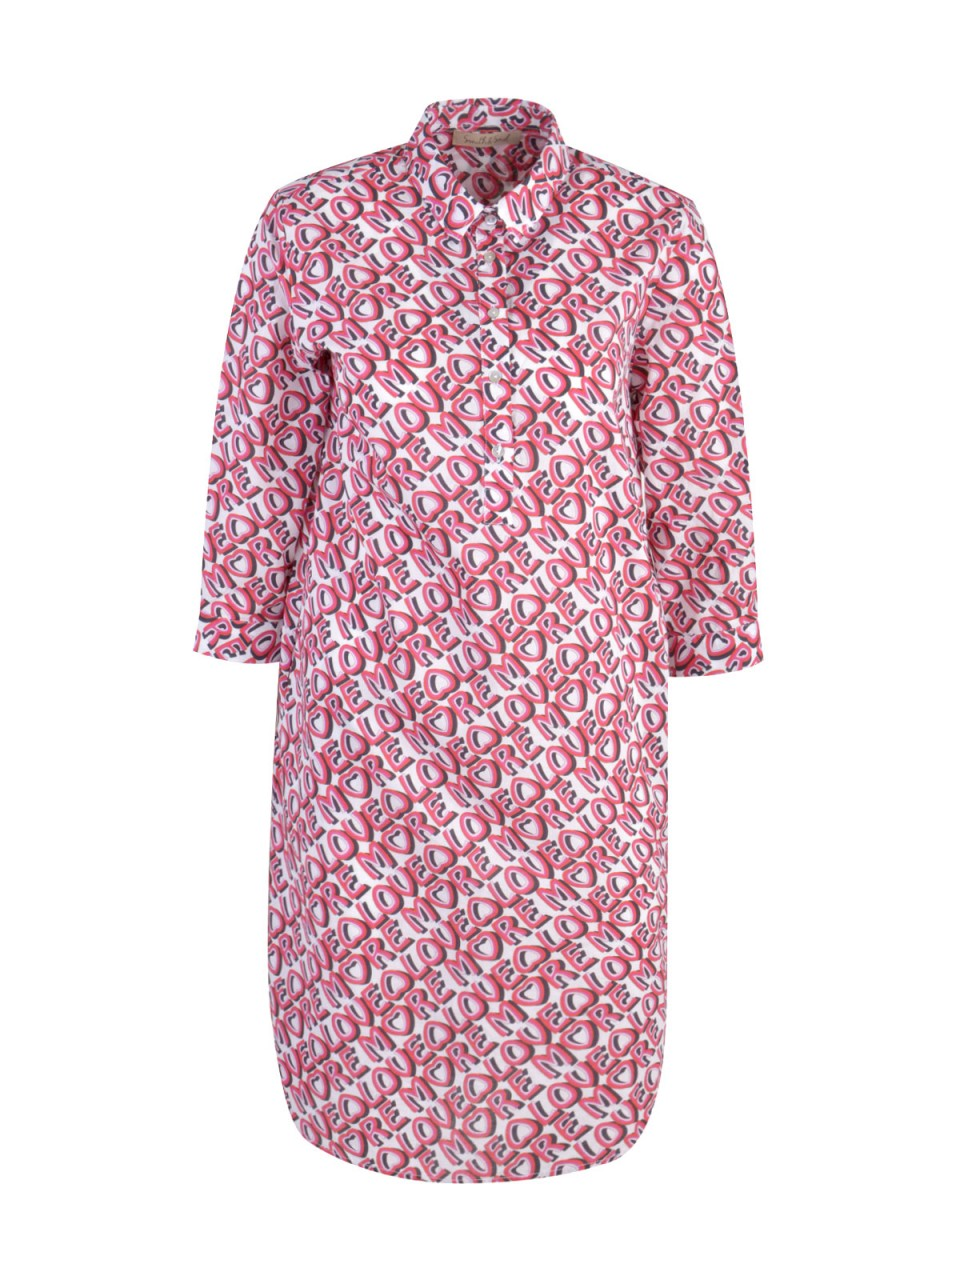 Kleider - SMITH SOUL Damen Kleid, rot  - Onlineshop Designermode.com